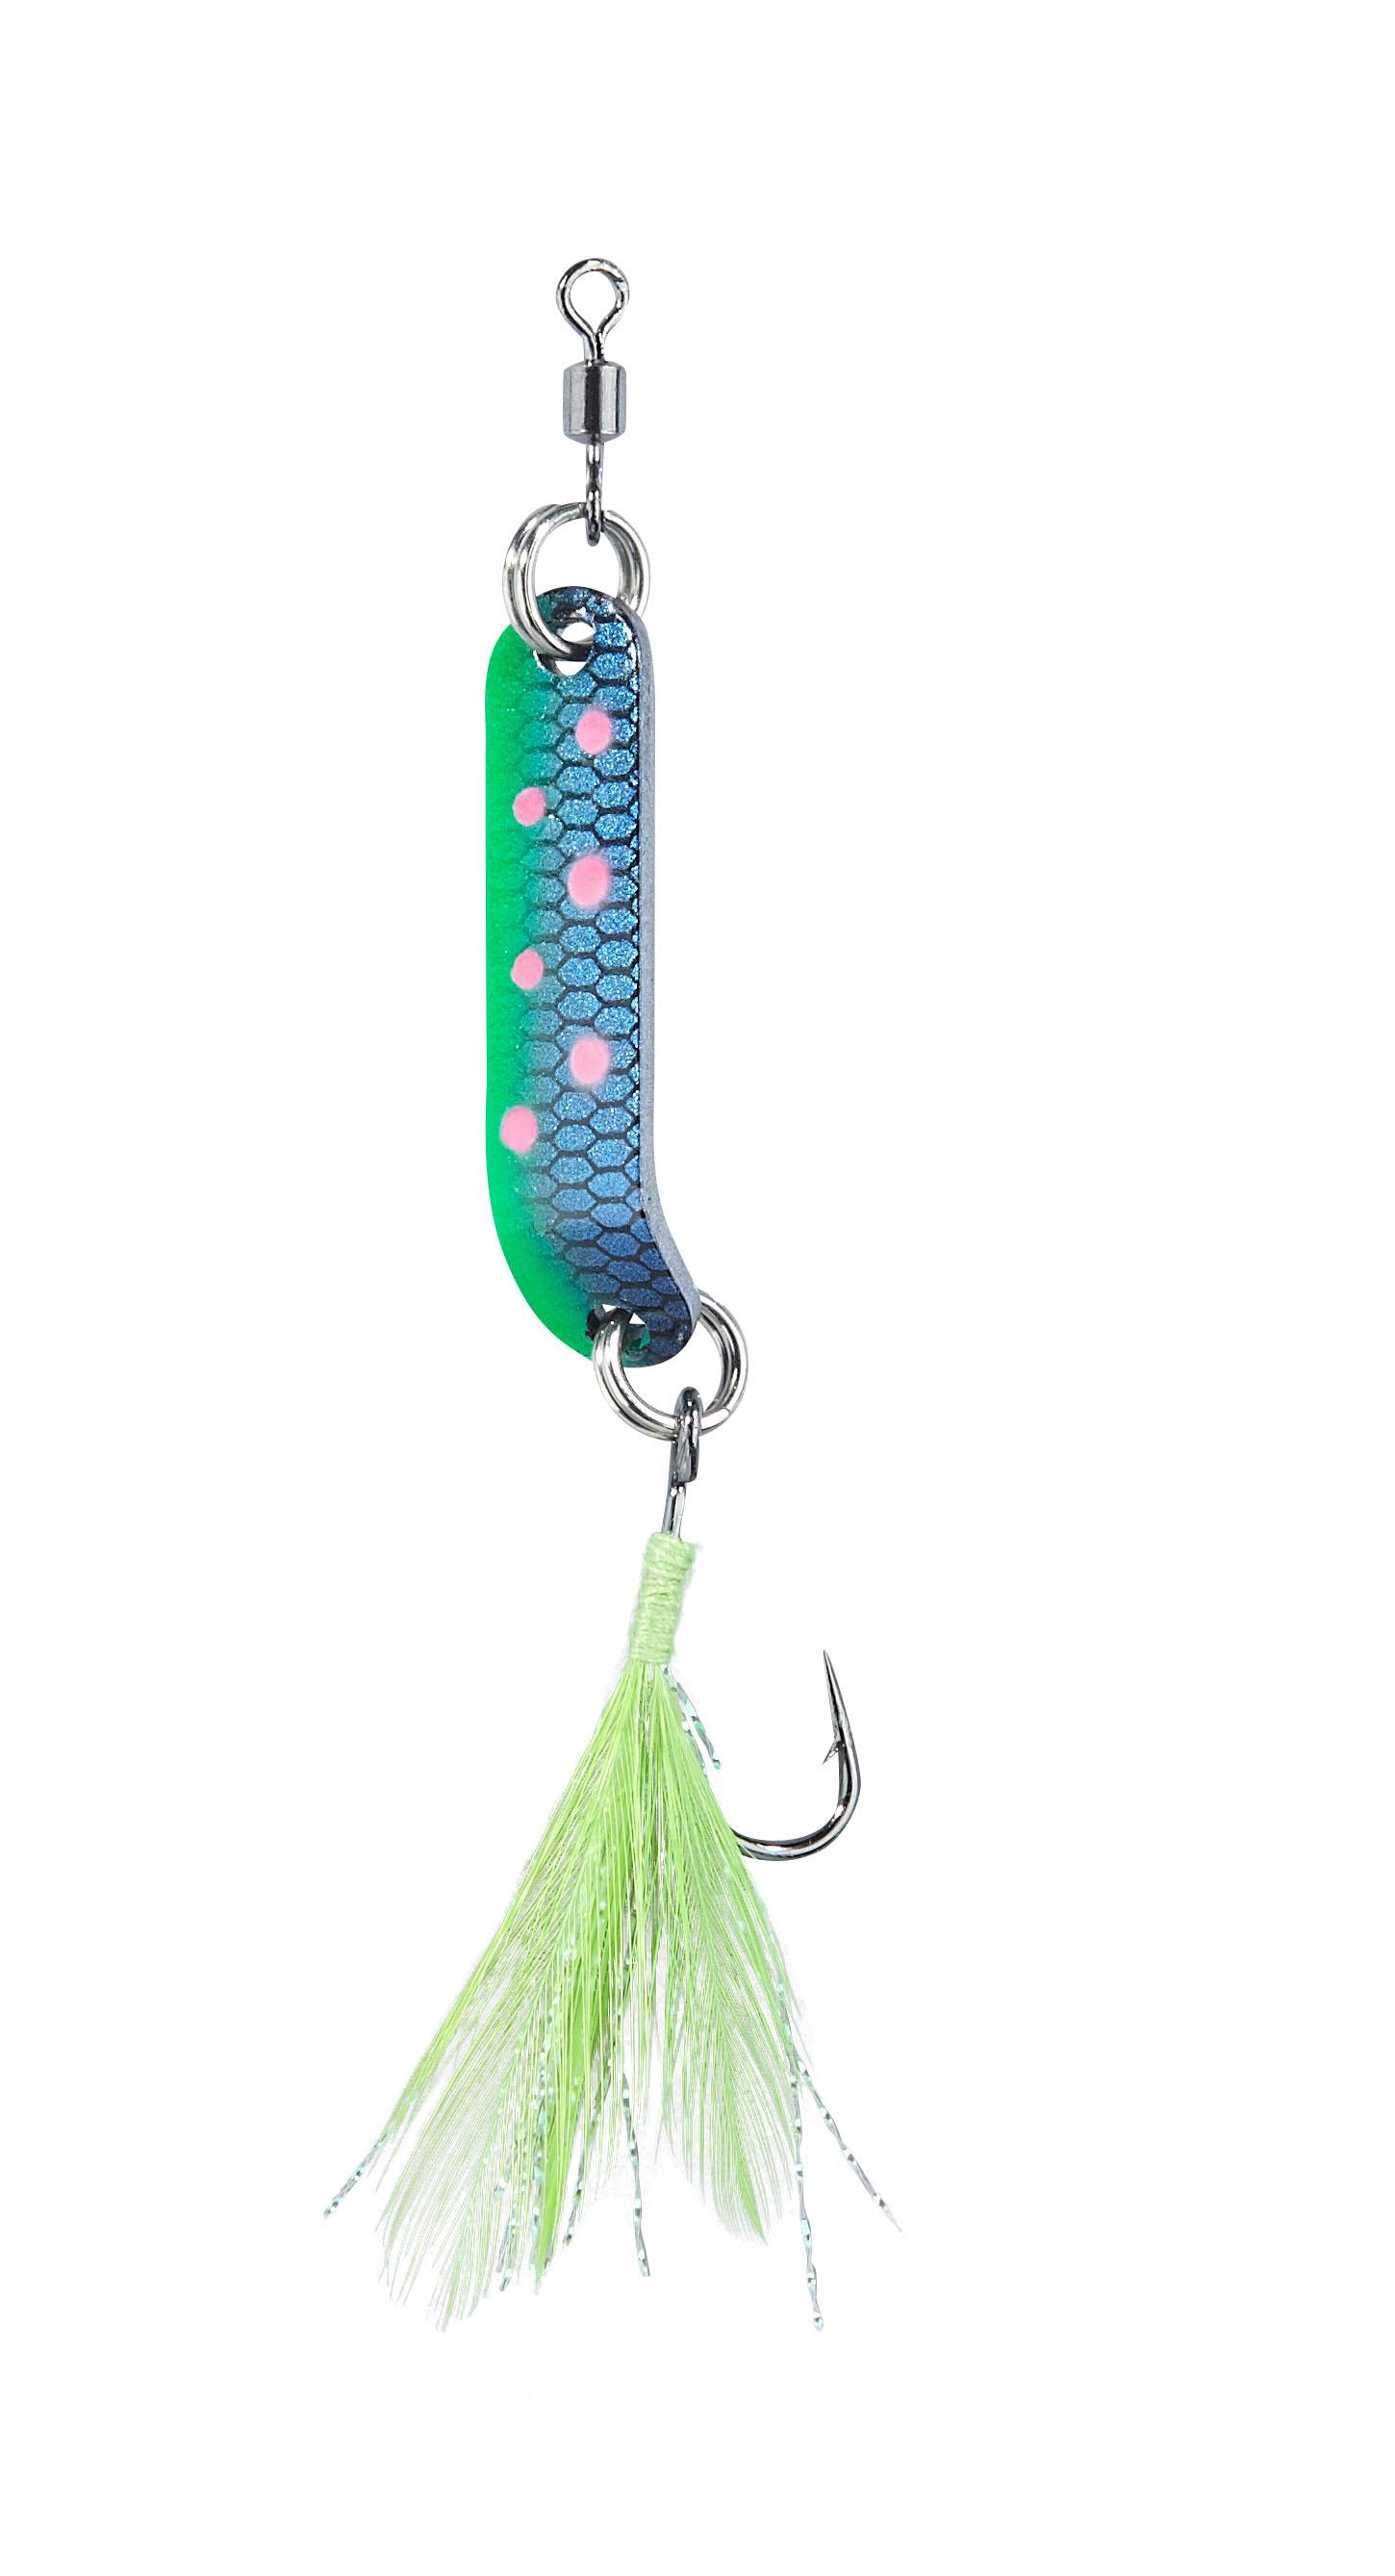 Balzer-trout-Attack-truchas-intermitentes-agro-con-gancho-individuales-3cm-2-5g-10-colores